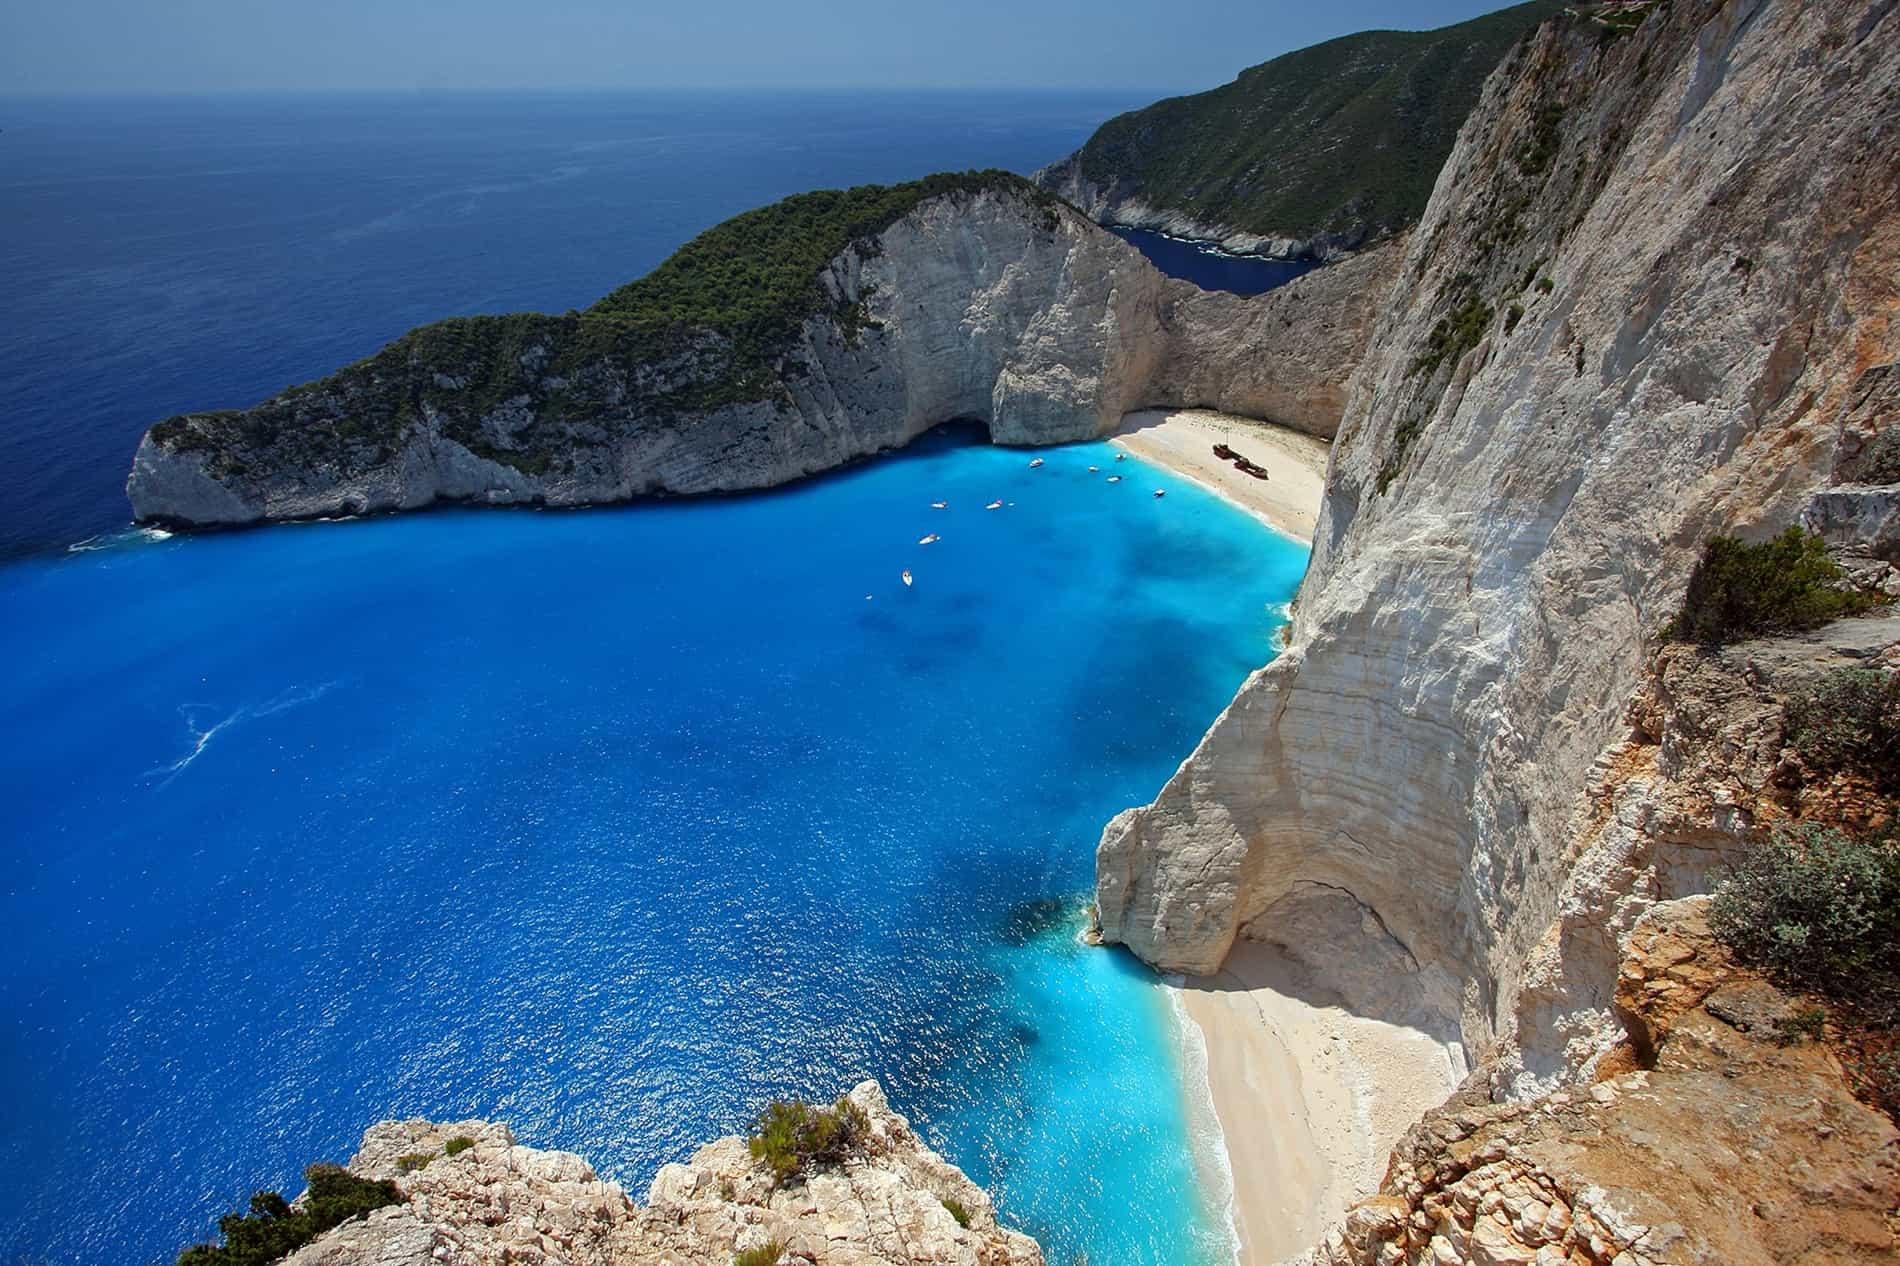 free picture: seashore, landscape, water, sea, beach, ocean, coast, bay